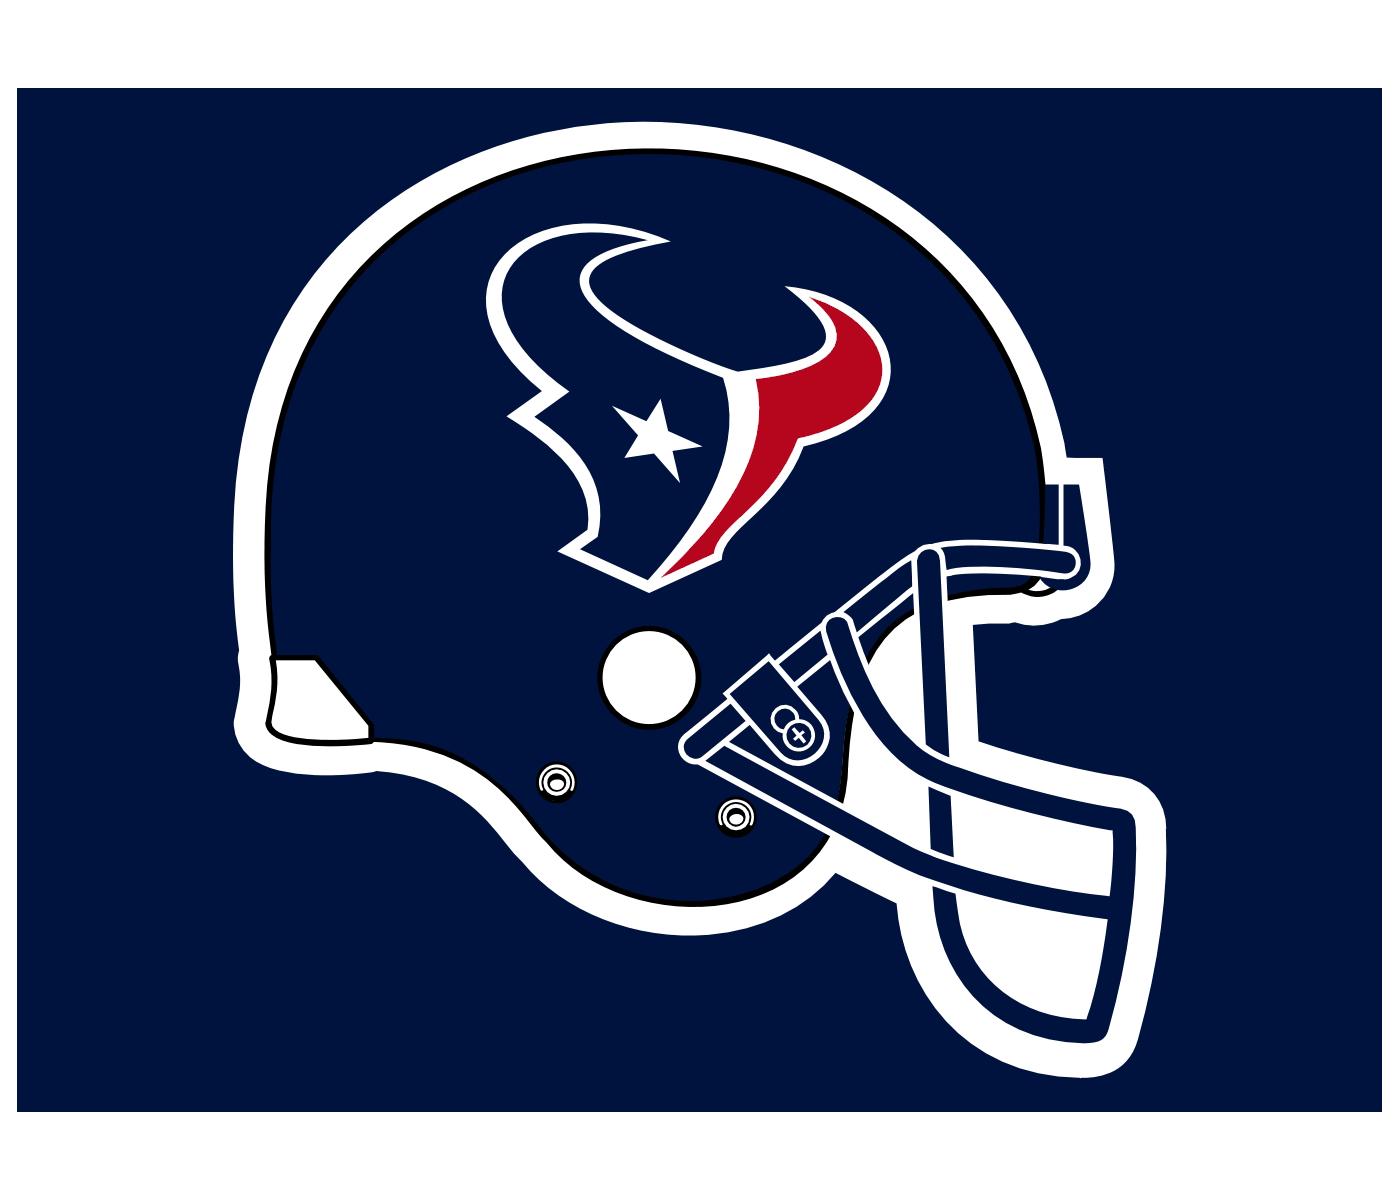 Houston Texans Logo PNG Transparent & SVG Vector